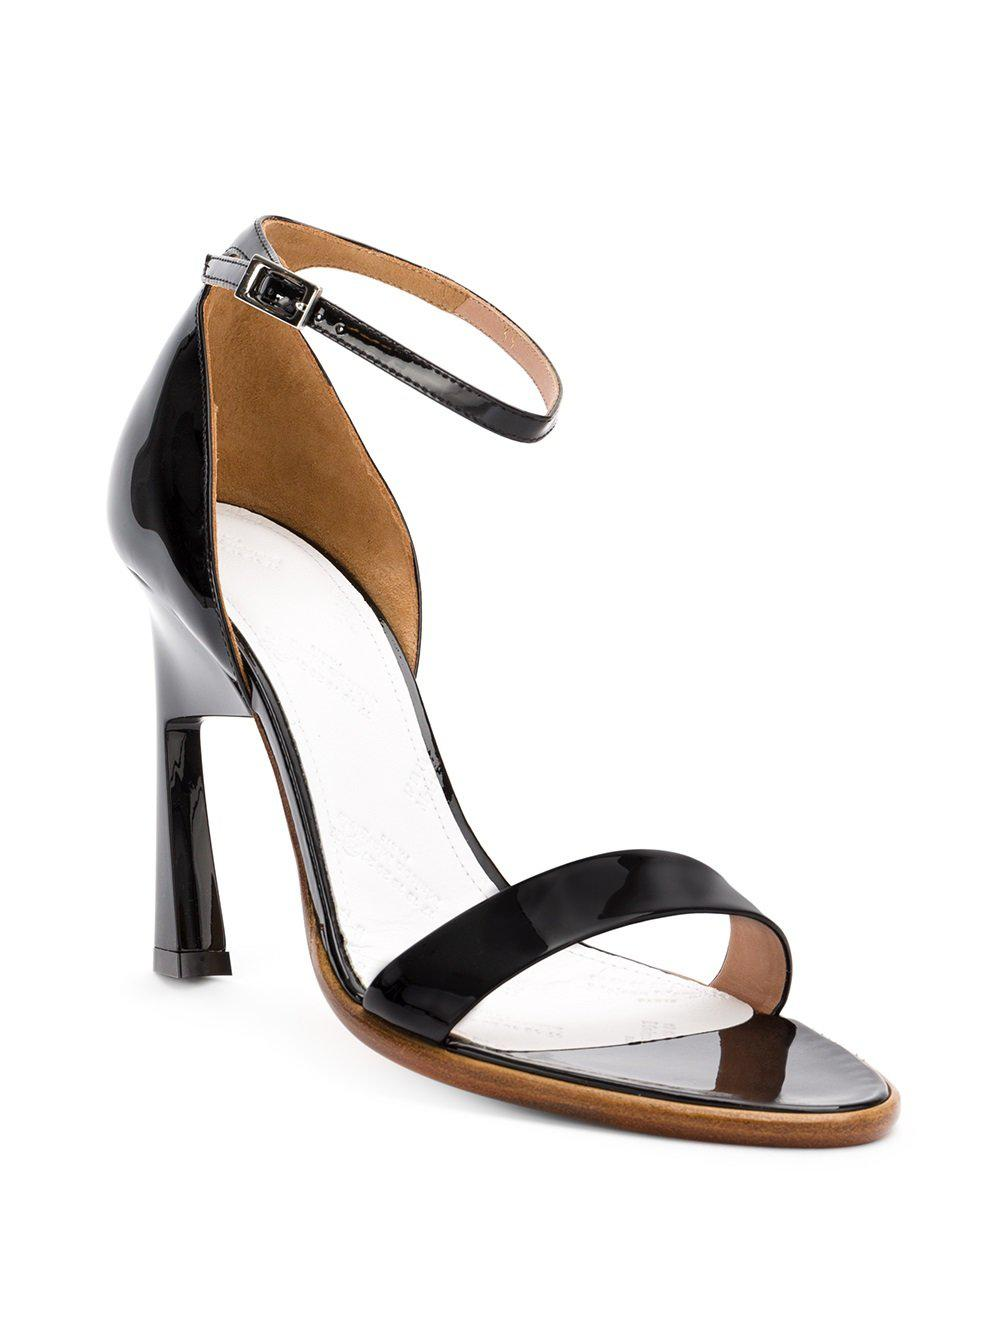 Geometric In Black Heel Margiela Sandals Maison Lyst FqHOx